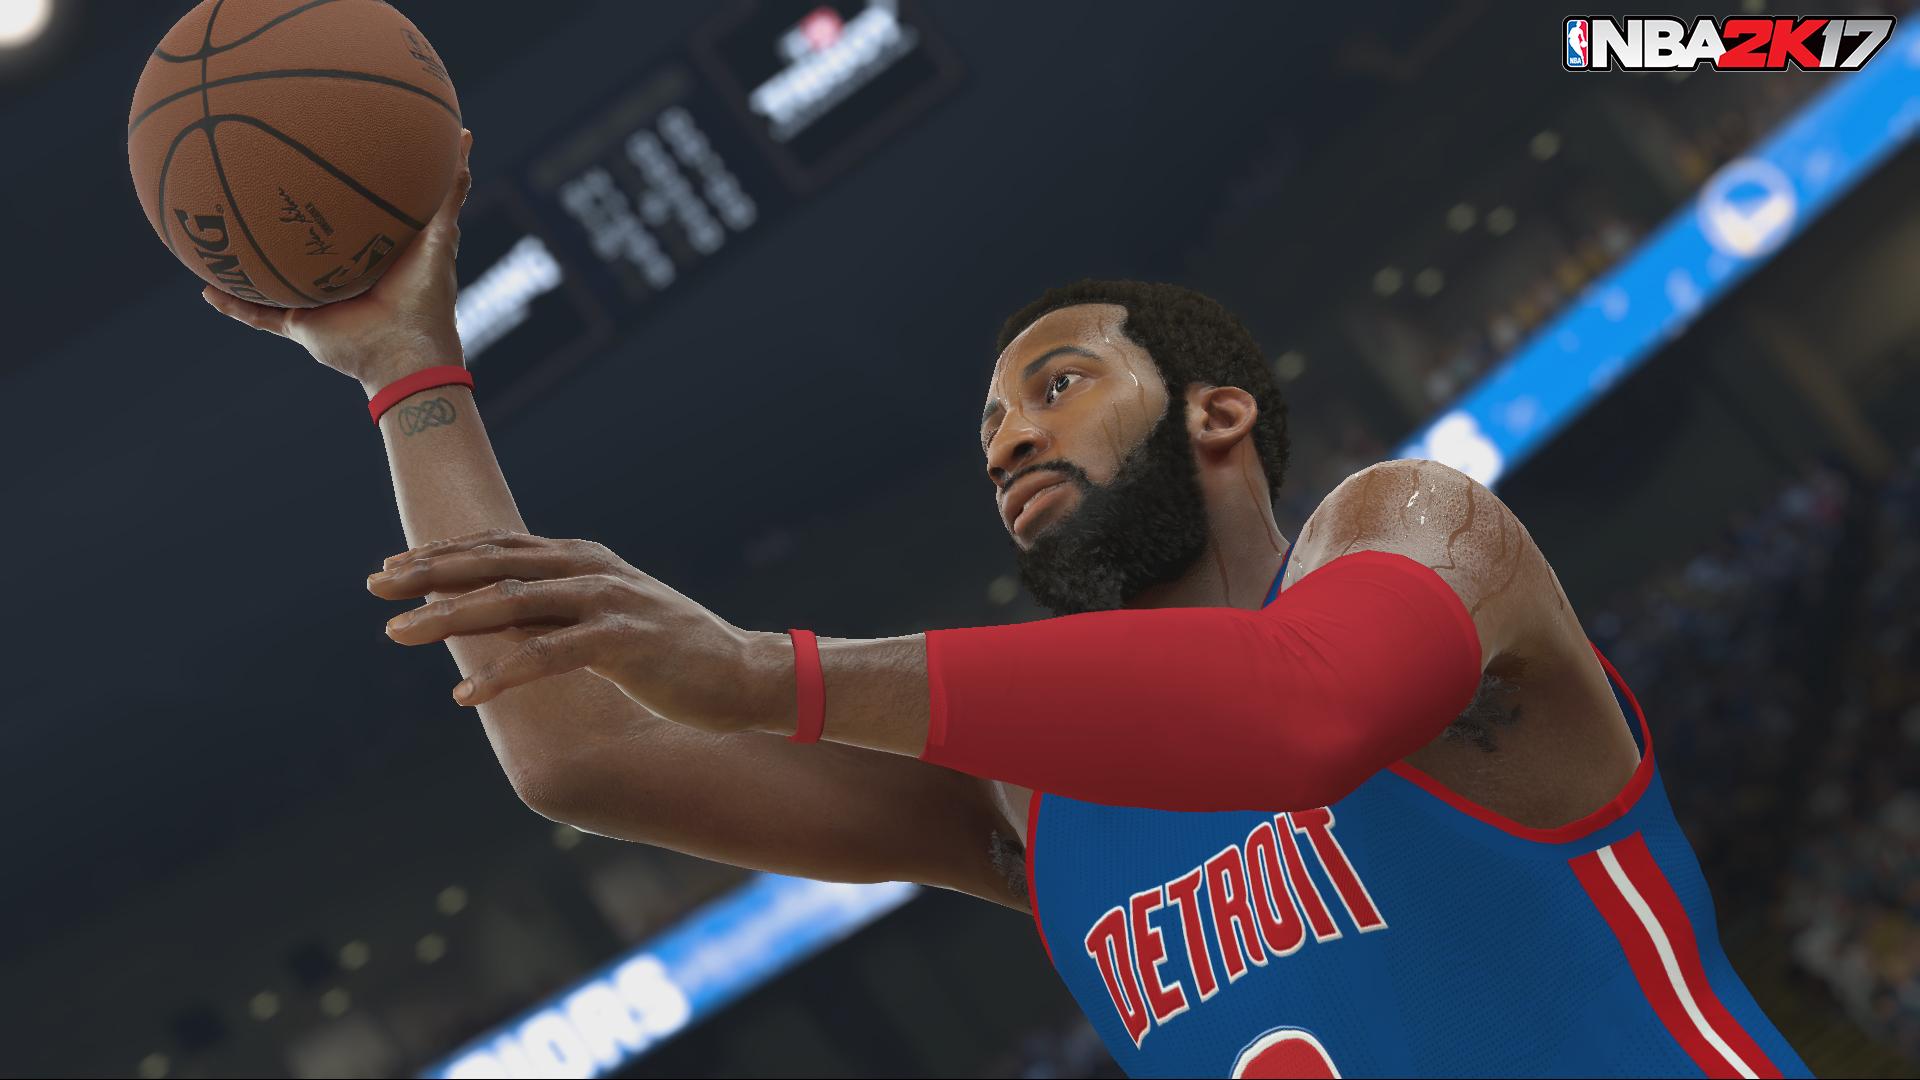 NBA 2K17 image 3